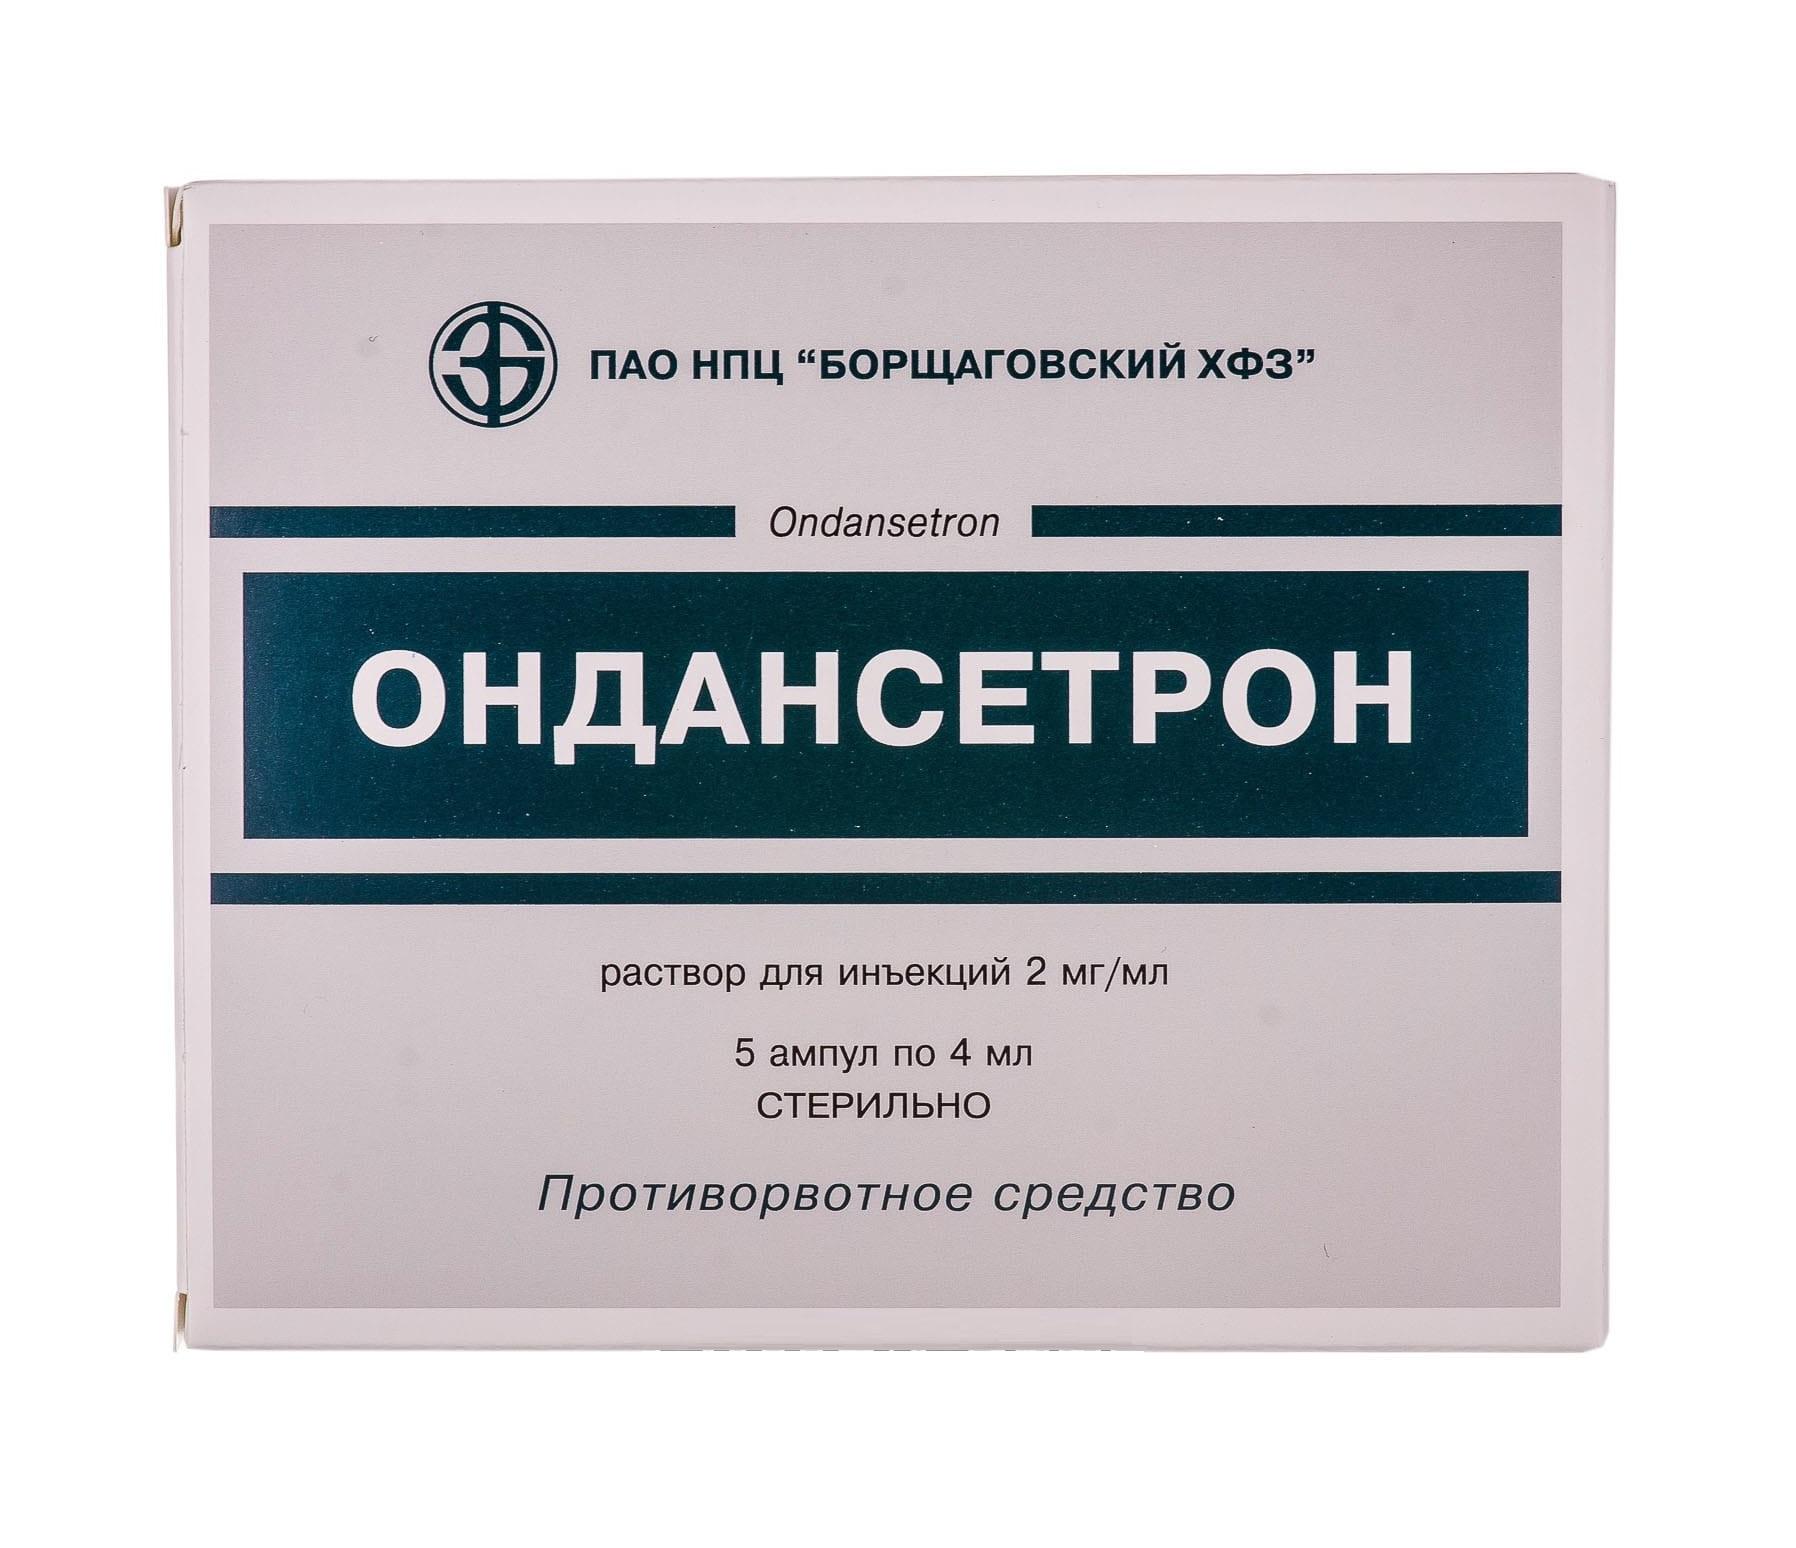 ОНДАНСЕТРОН АМП. 2МГ/МЛ 4МЛ №5 без ндс